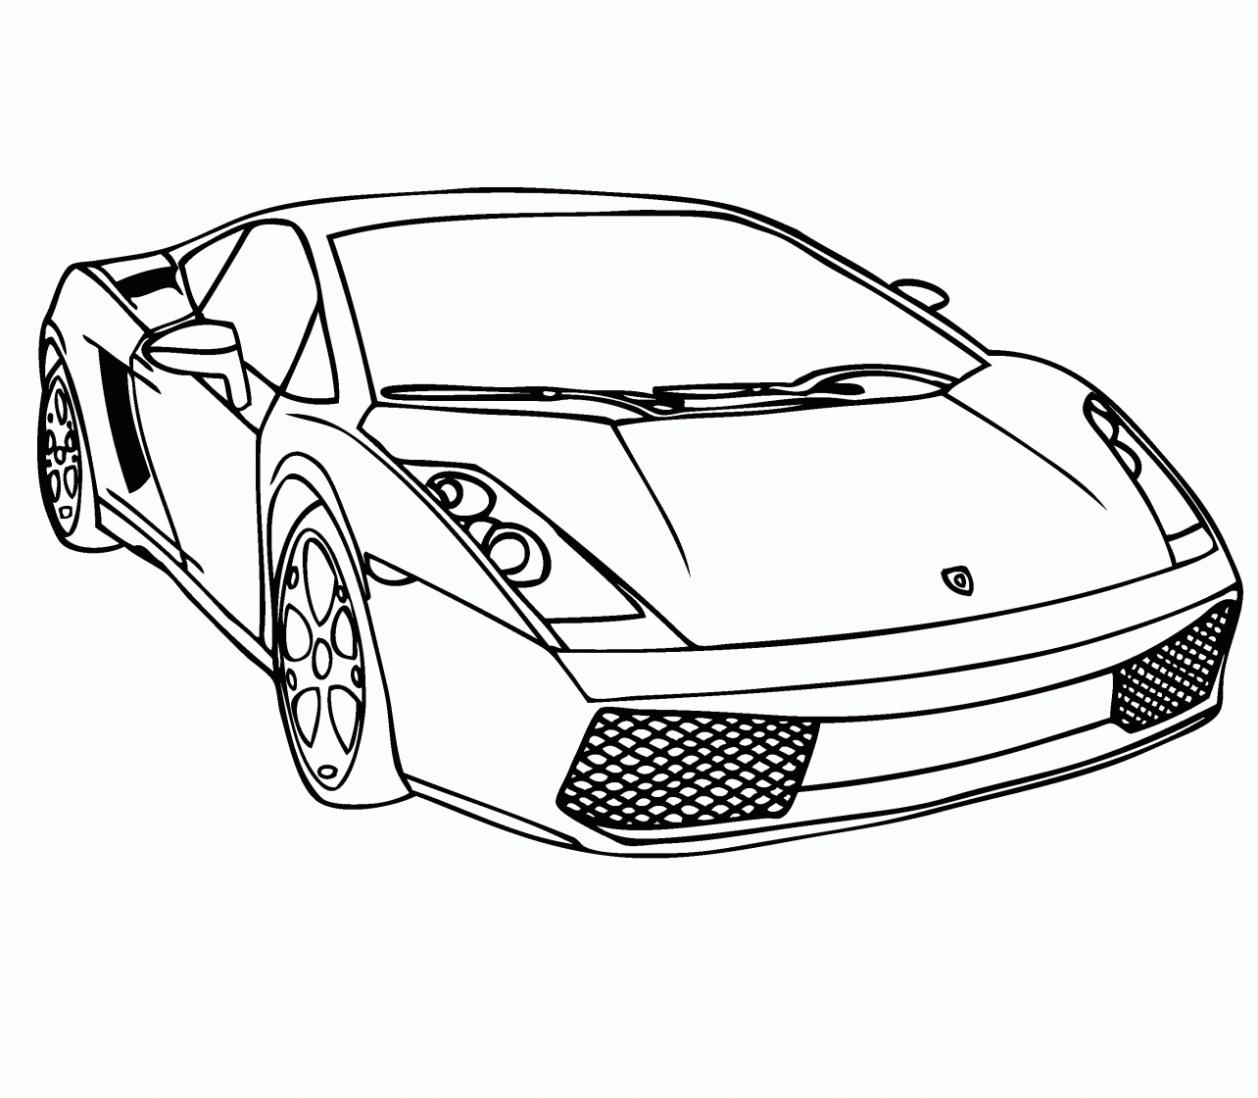 Ausmalbild Rennauto | Malvorlage Auto, Ausmalbilder Zum in Malvorlagen Lamborghini